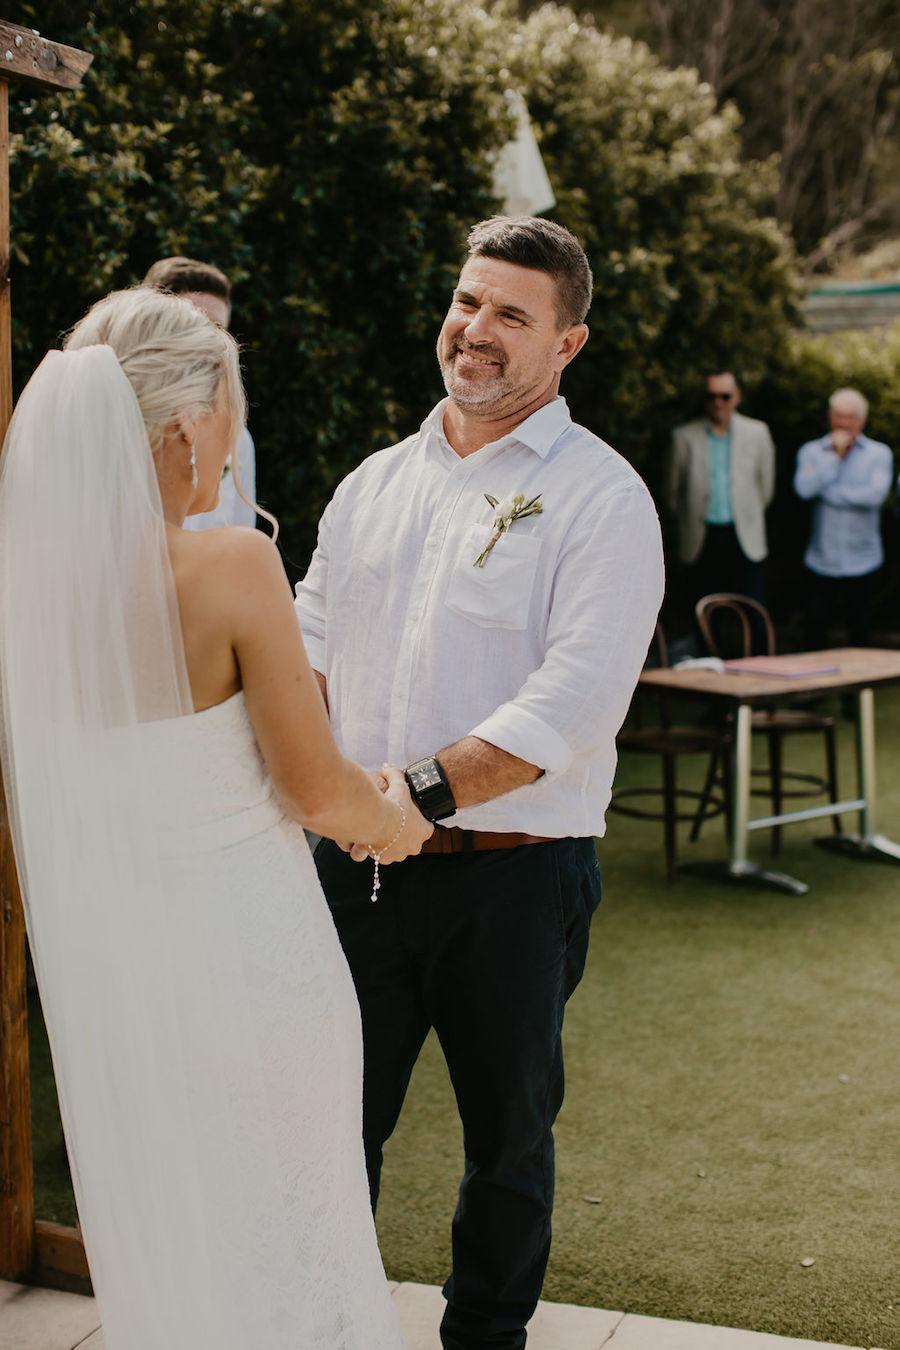 tweed-coast-weddings-wedding-venue-osteria-casuarina-ceremony-reception-5D3A6940.jpg